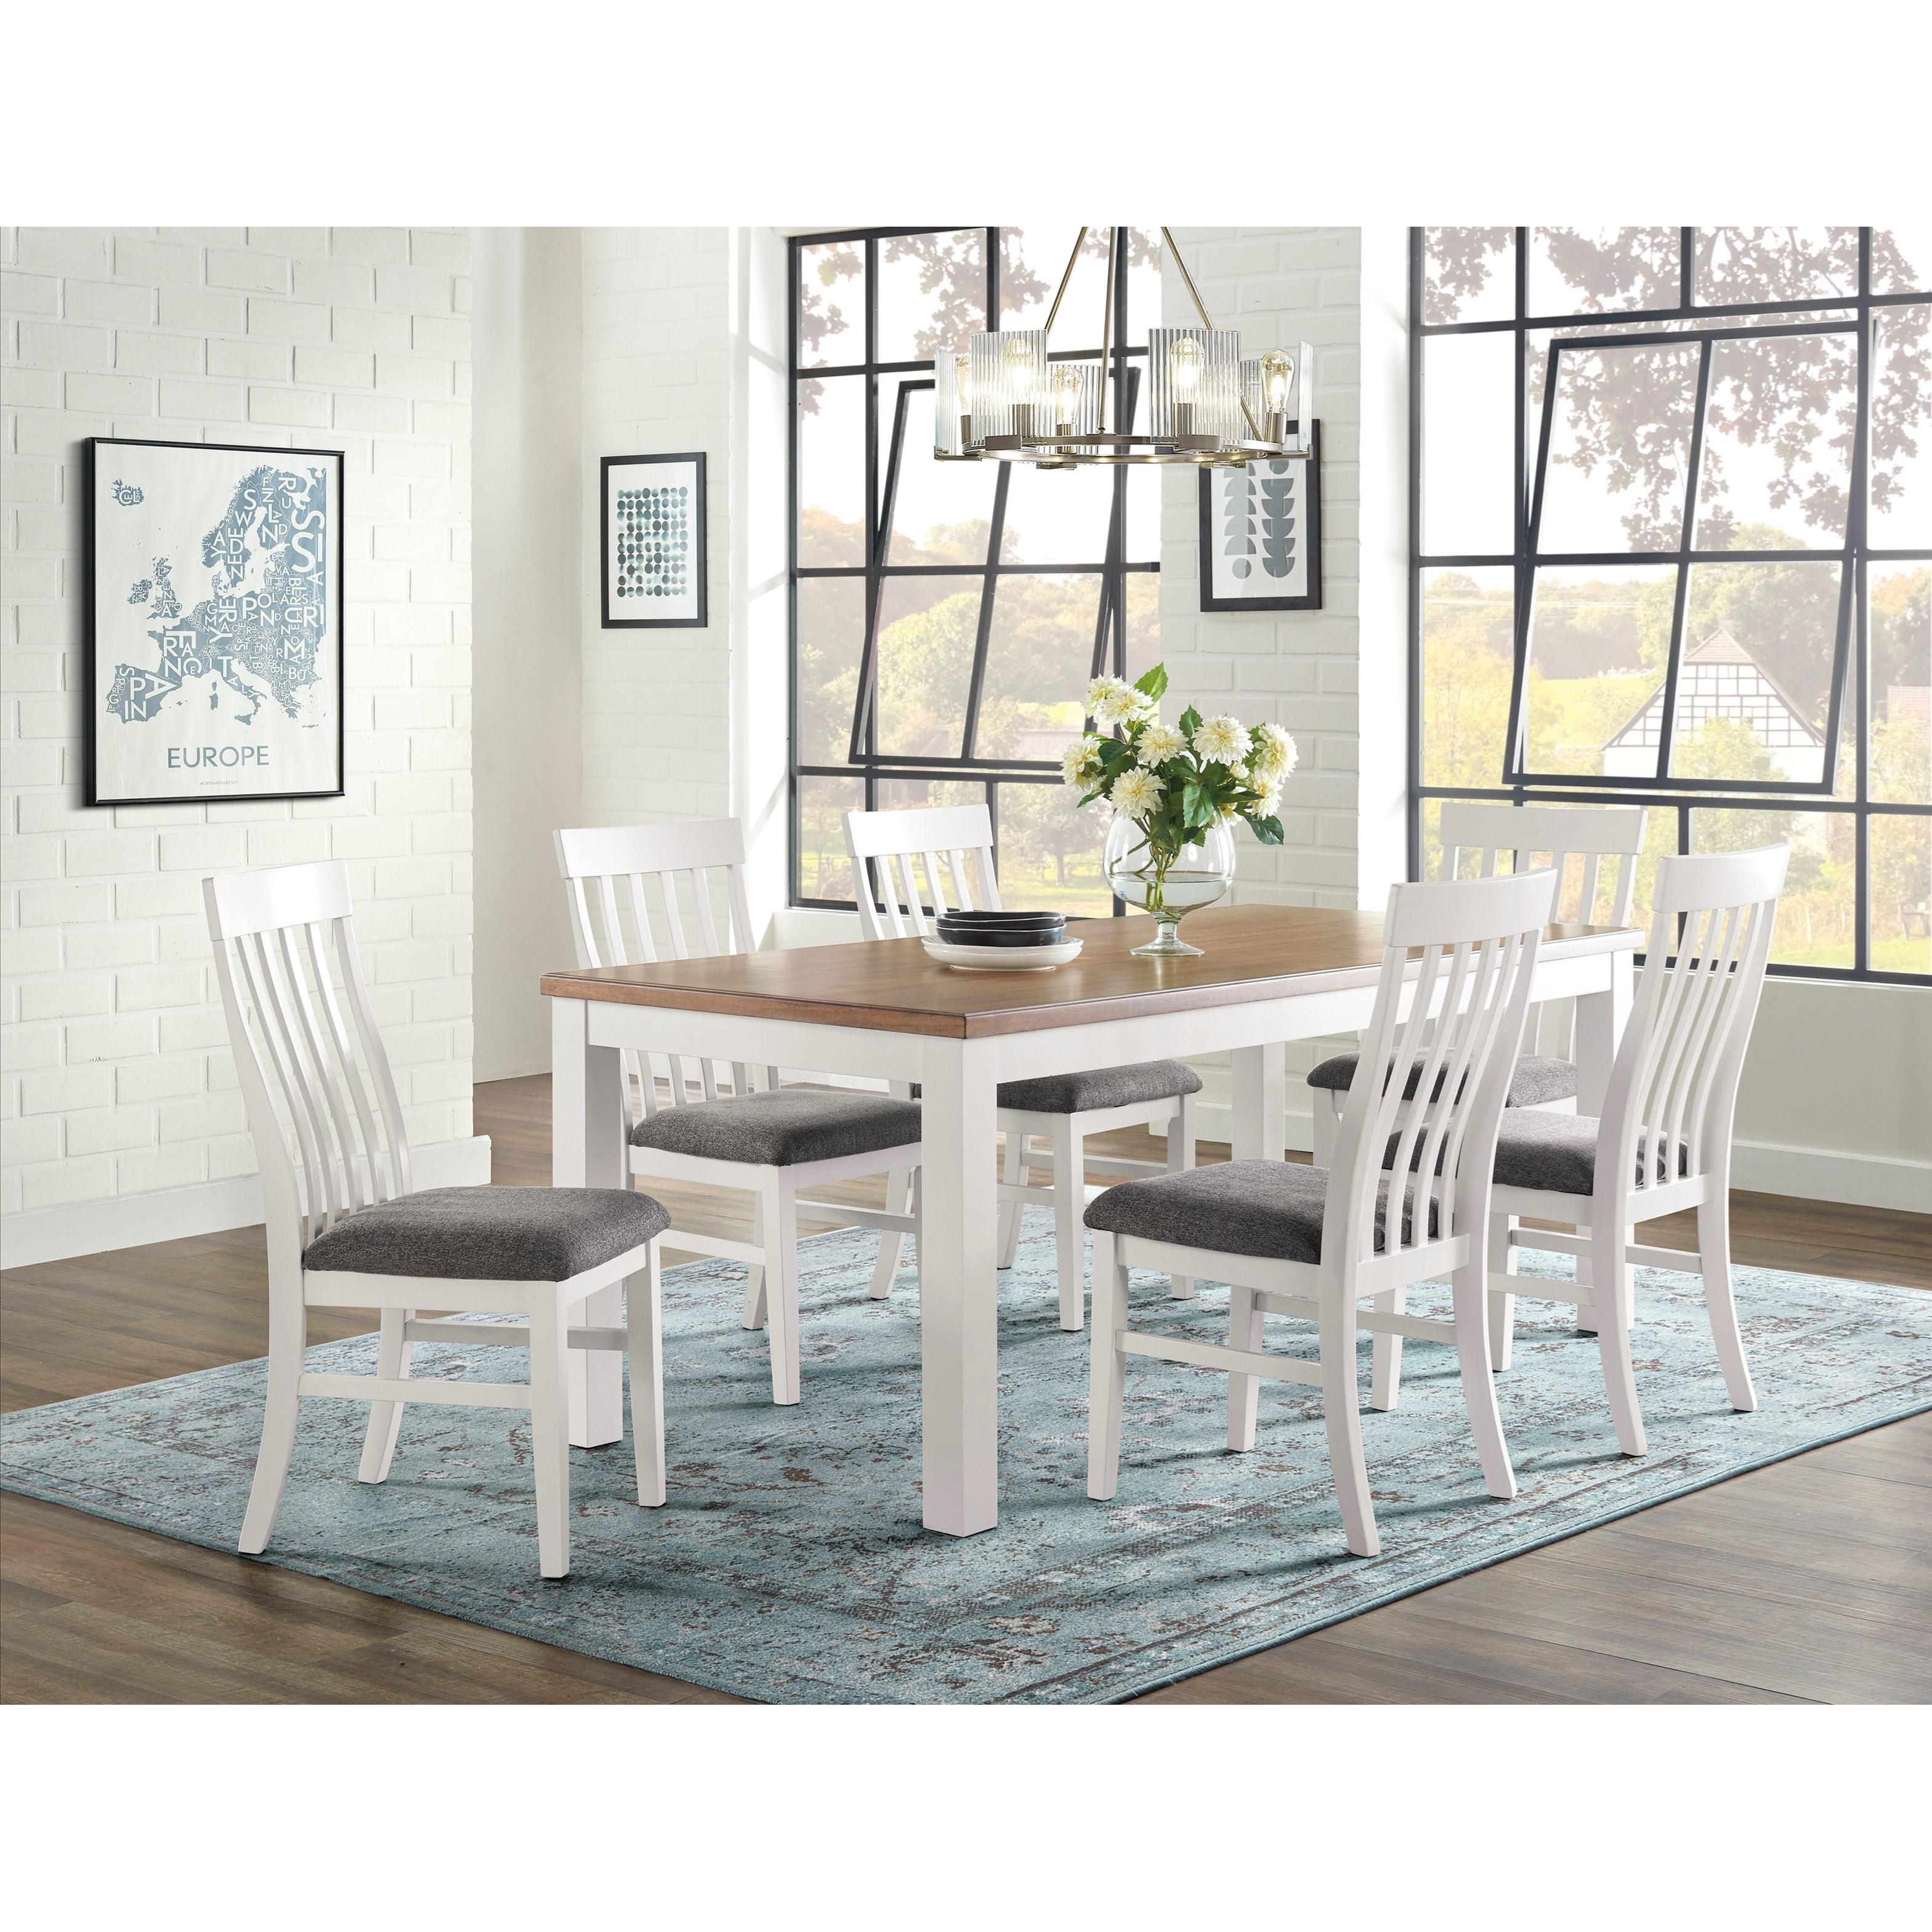 Westconi 7-Piece Dining Set by Ashley Furniture at HomeWorld Furniture